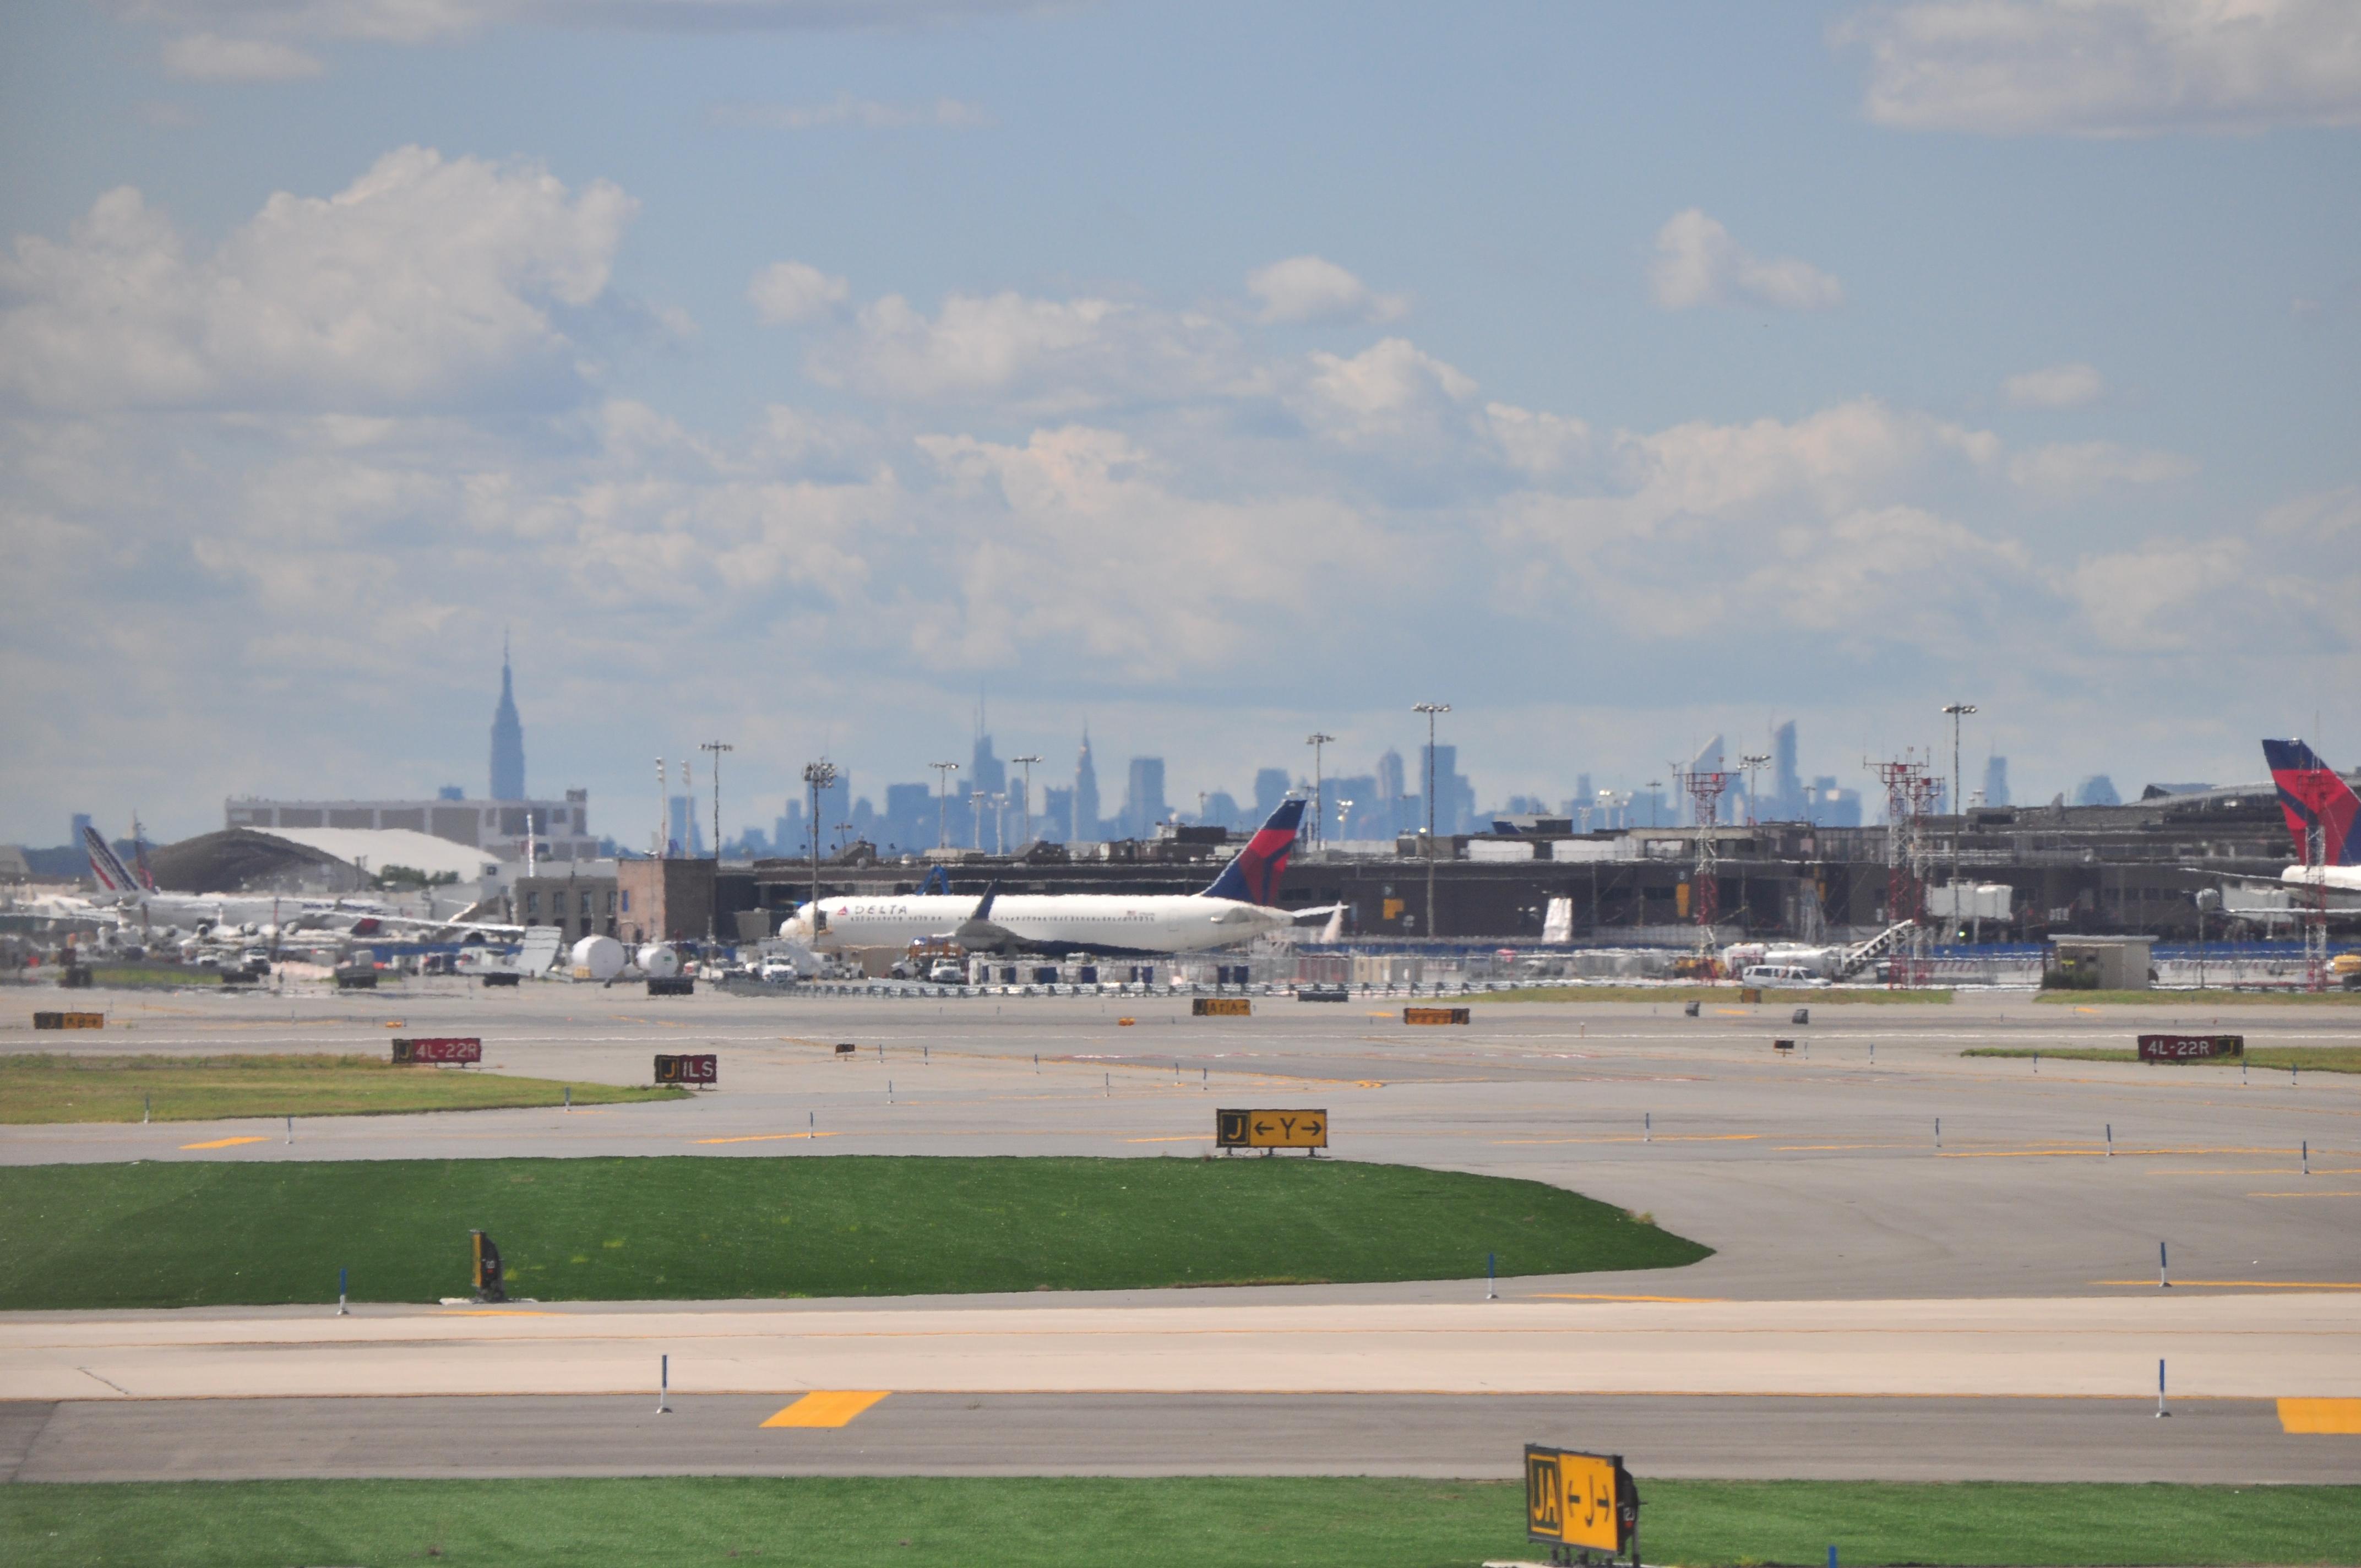 Elicottero Jfk Manhattan : File manhattan skyline from jfk  g